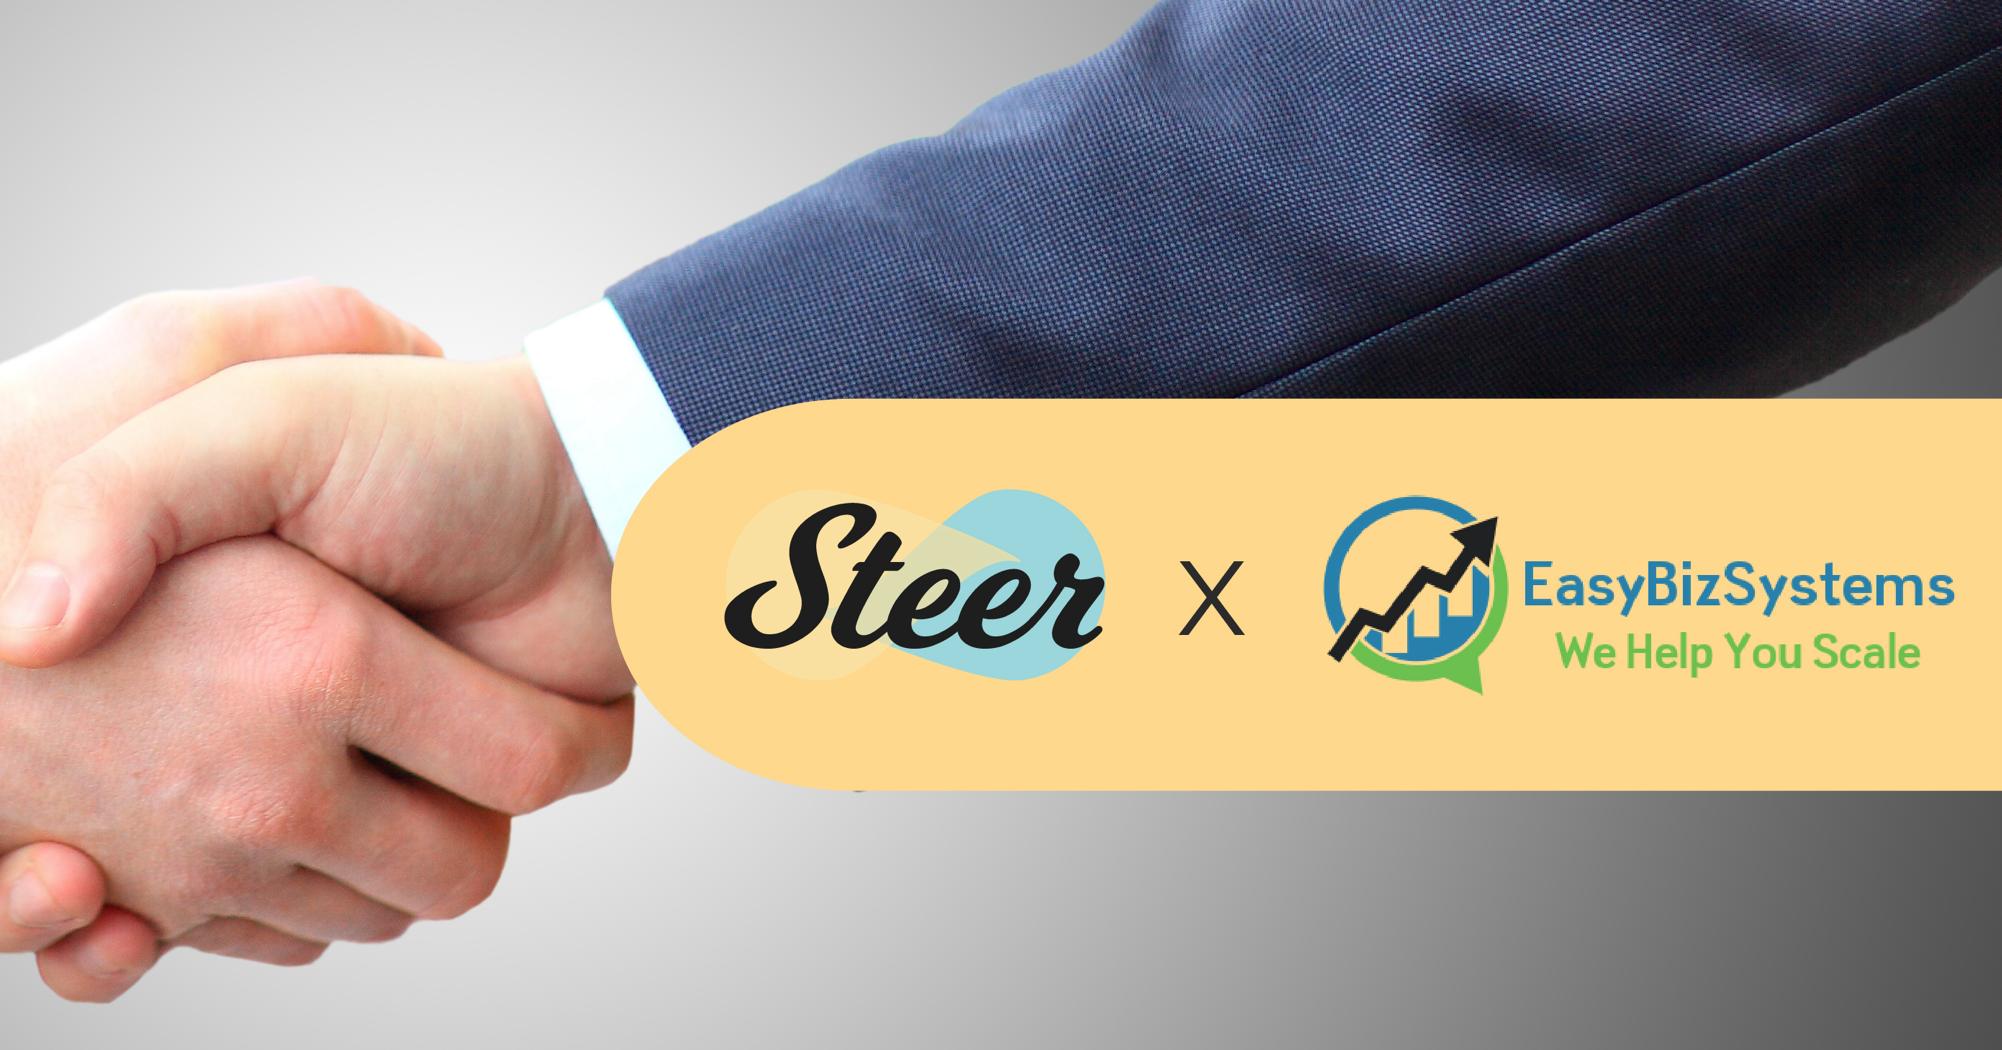 Steer partners with EasyBizSystems